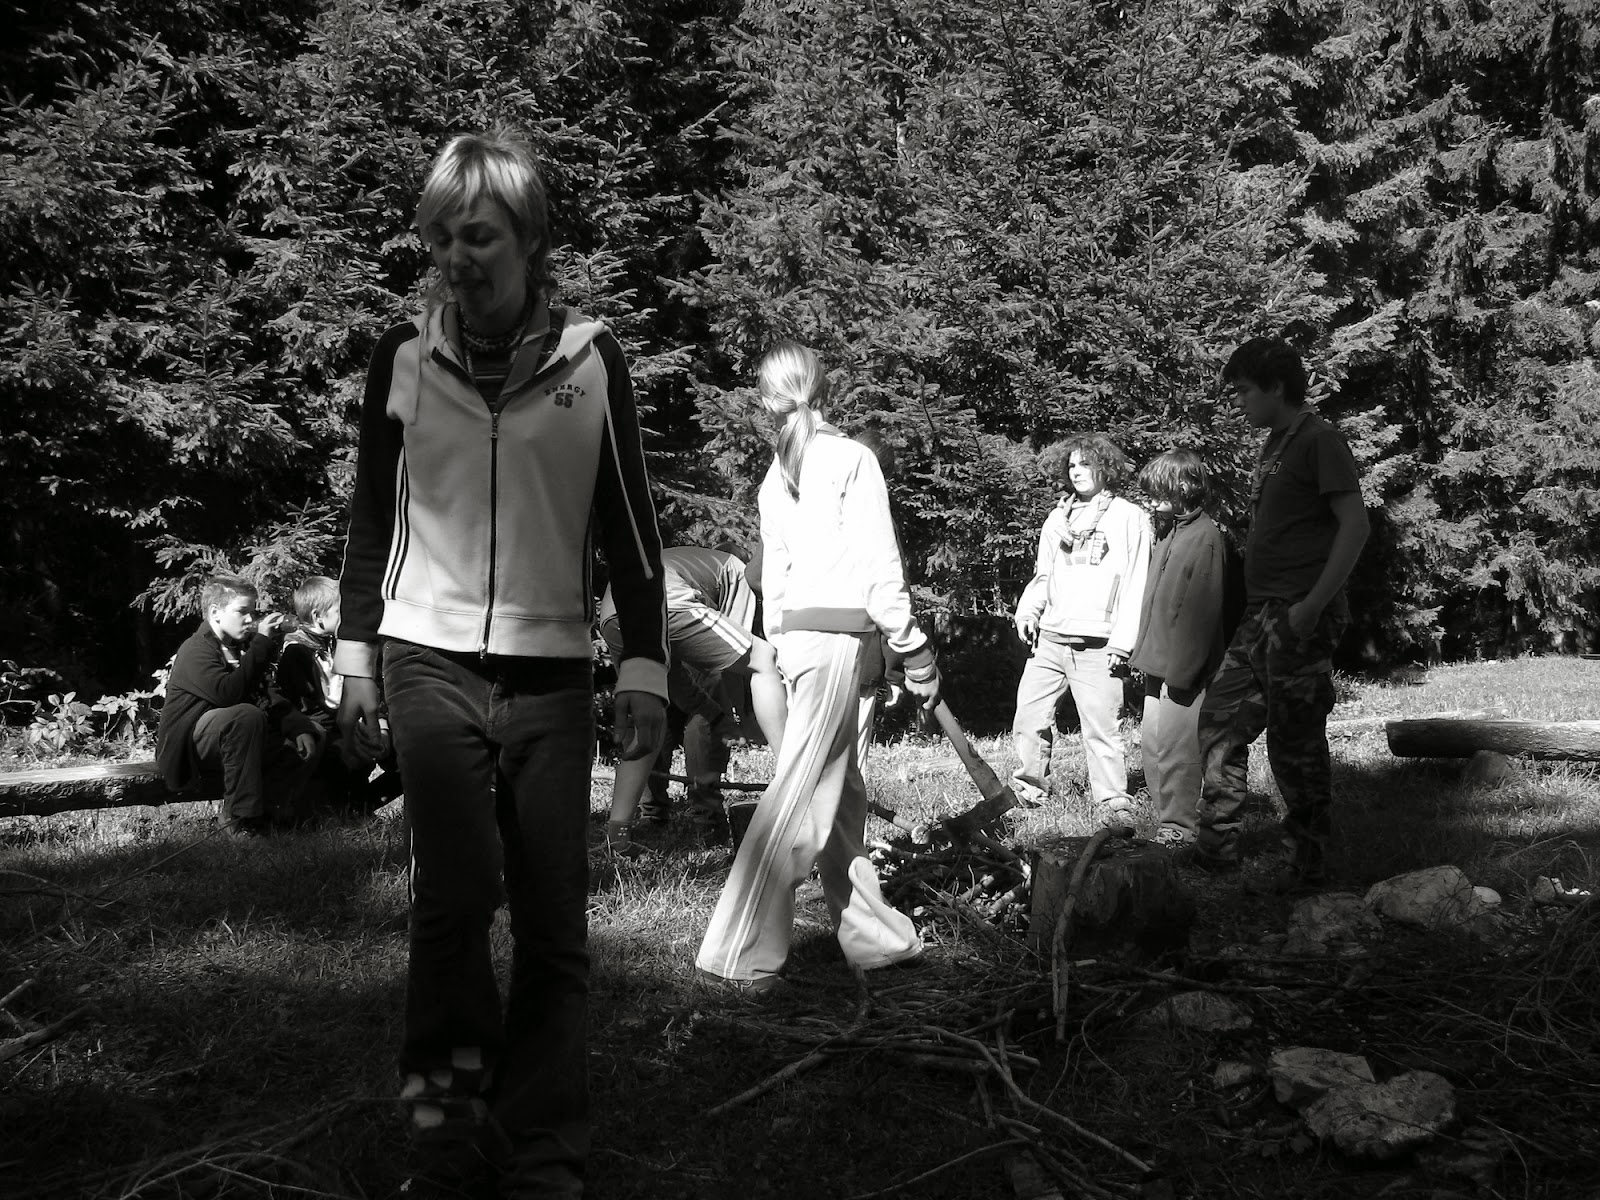 Vodov izlet, Ilirska Bistrica 2005 - Picture%2B124.jpg